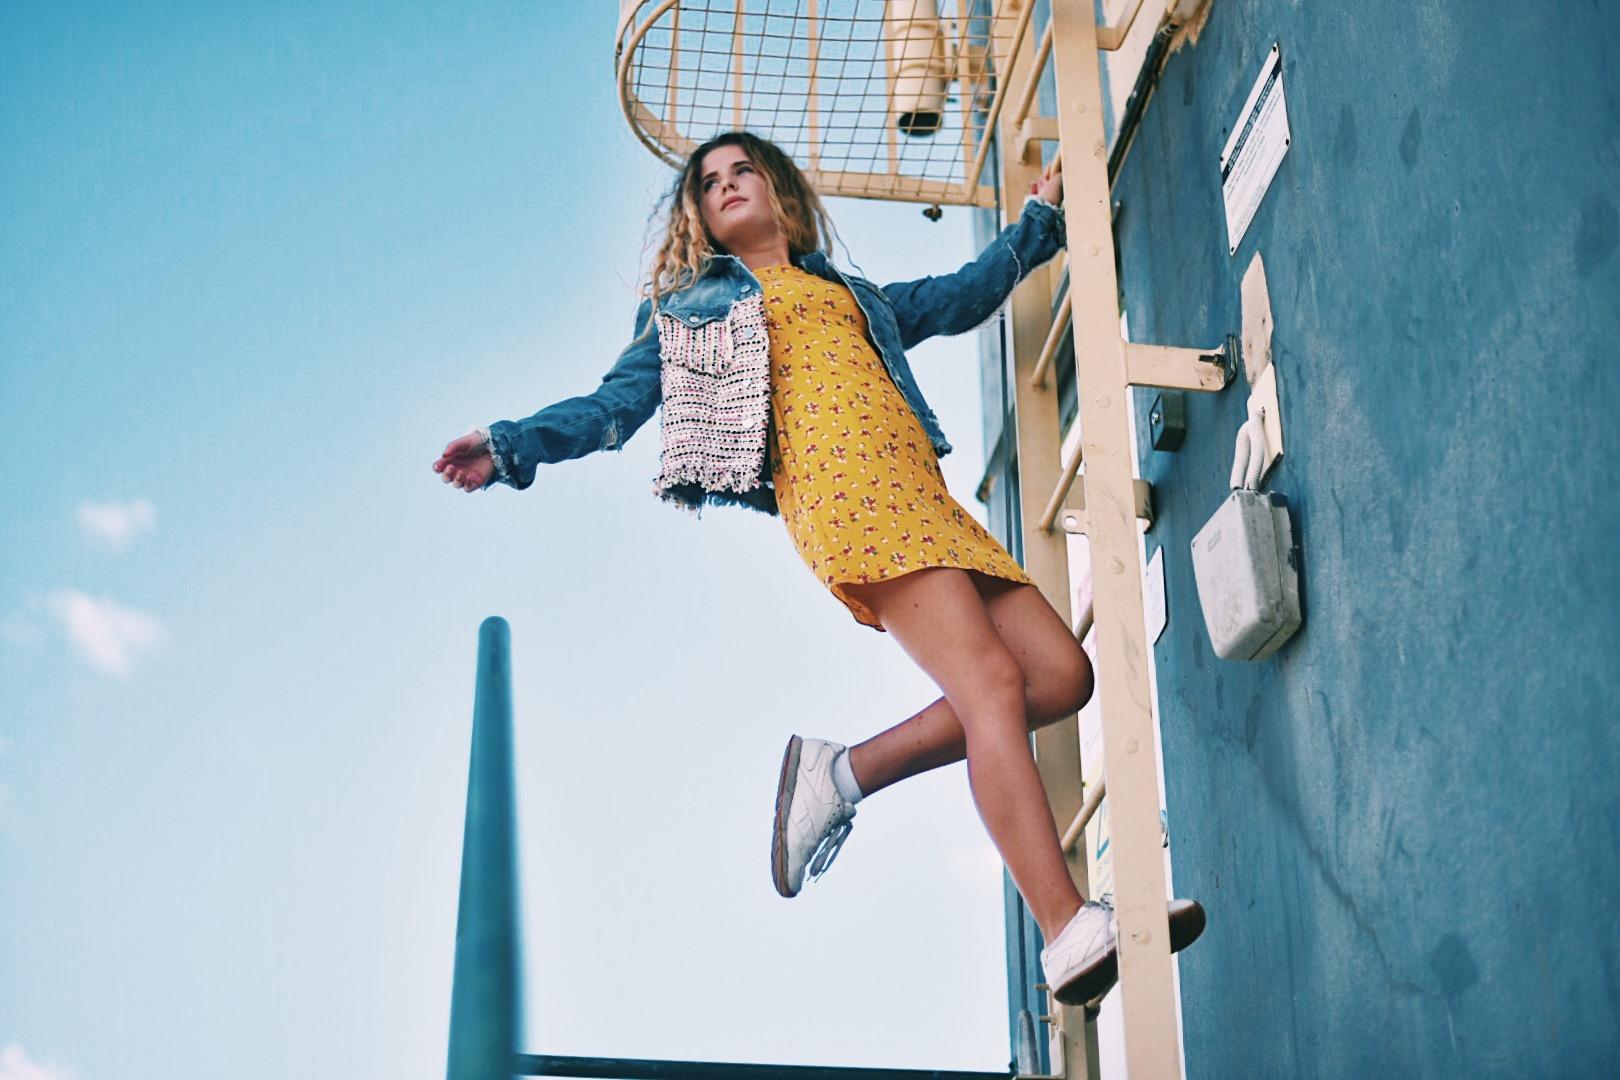 gretacaptures-rooftop-shooting-inspiration-photography-brisbane-australia